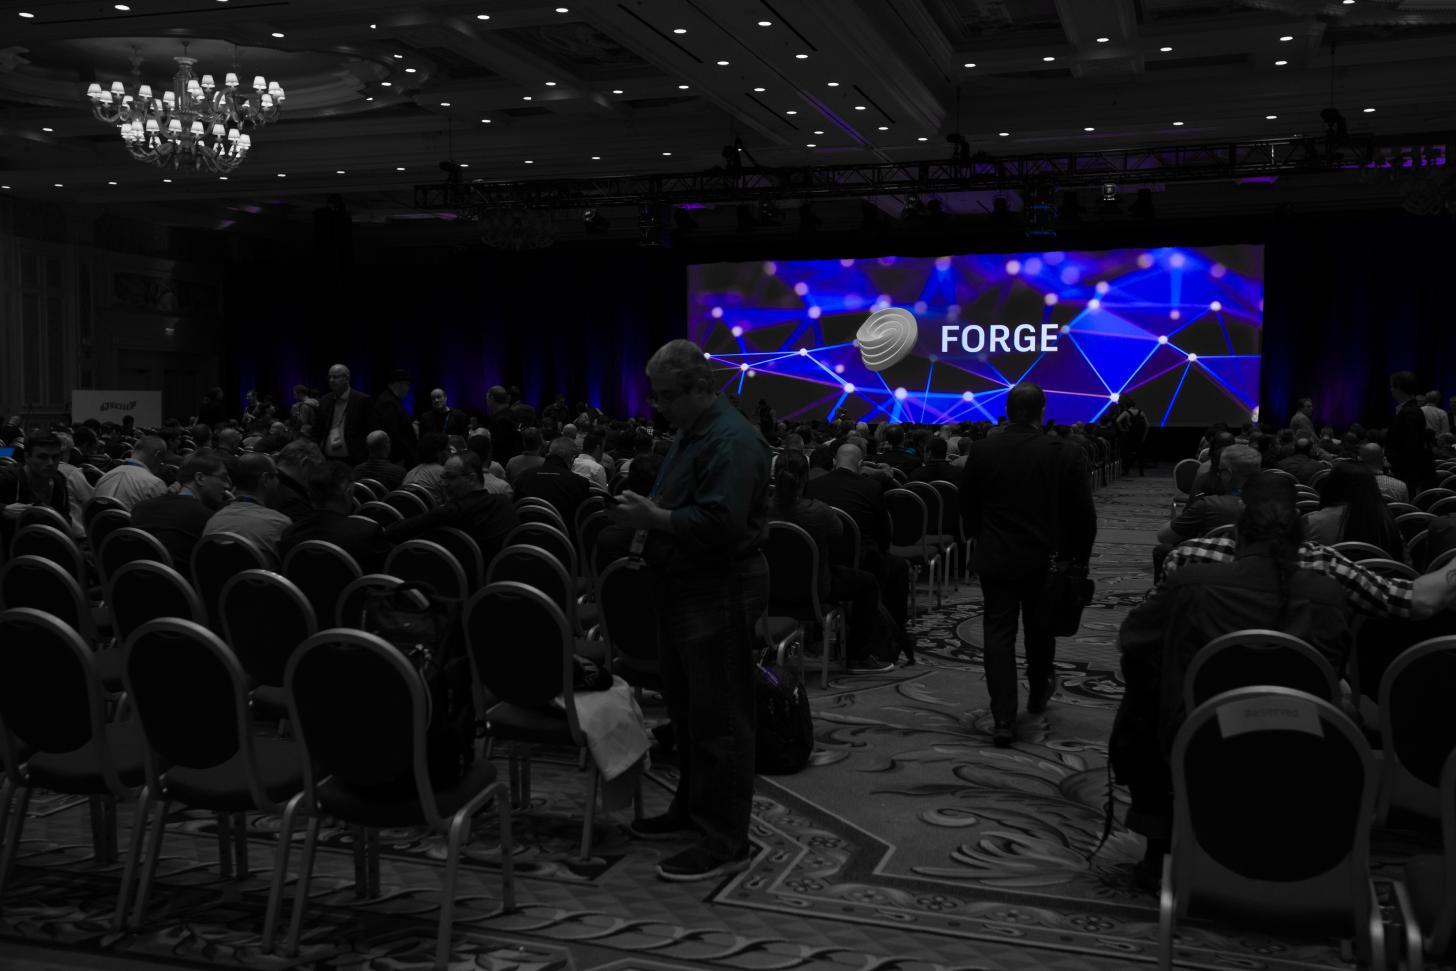 Forge DevCon in Las Vegas